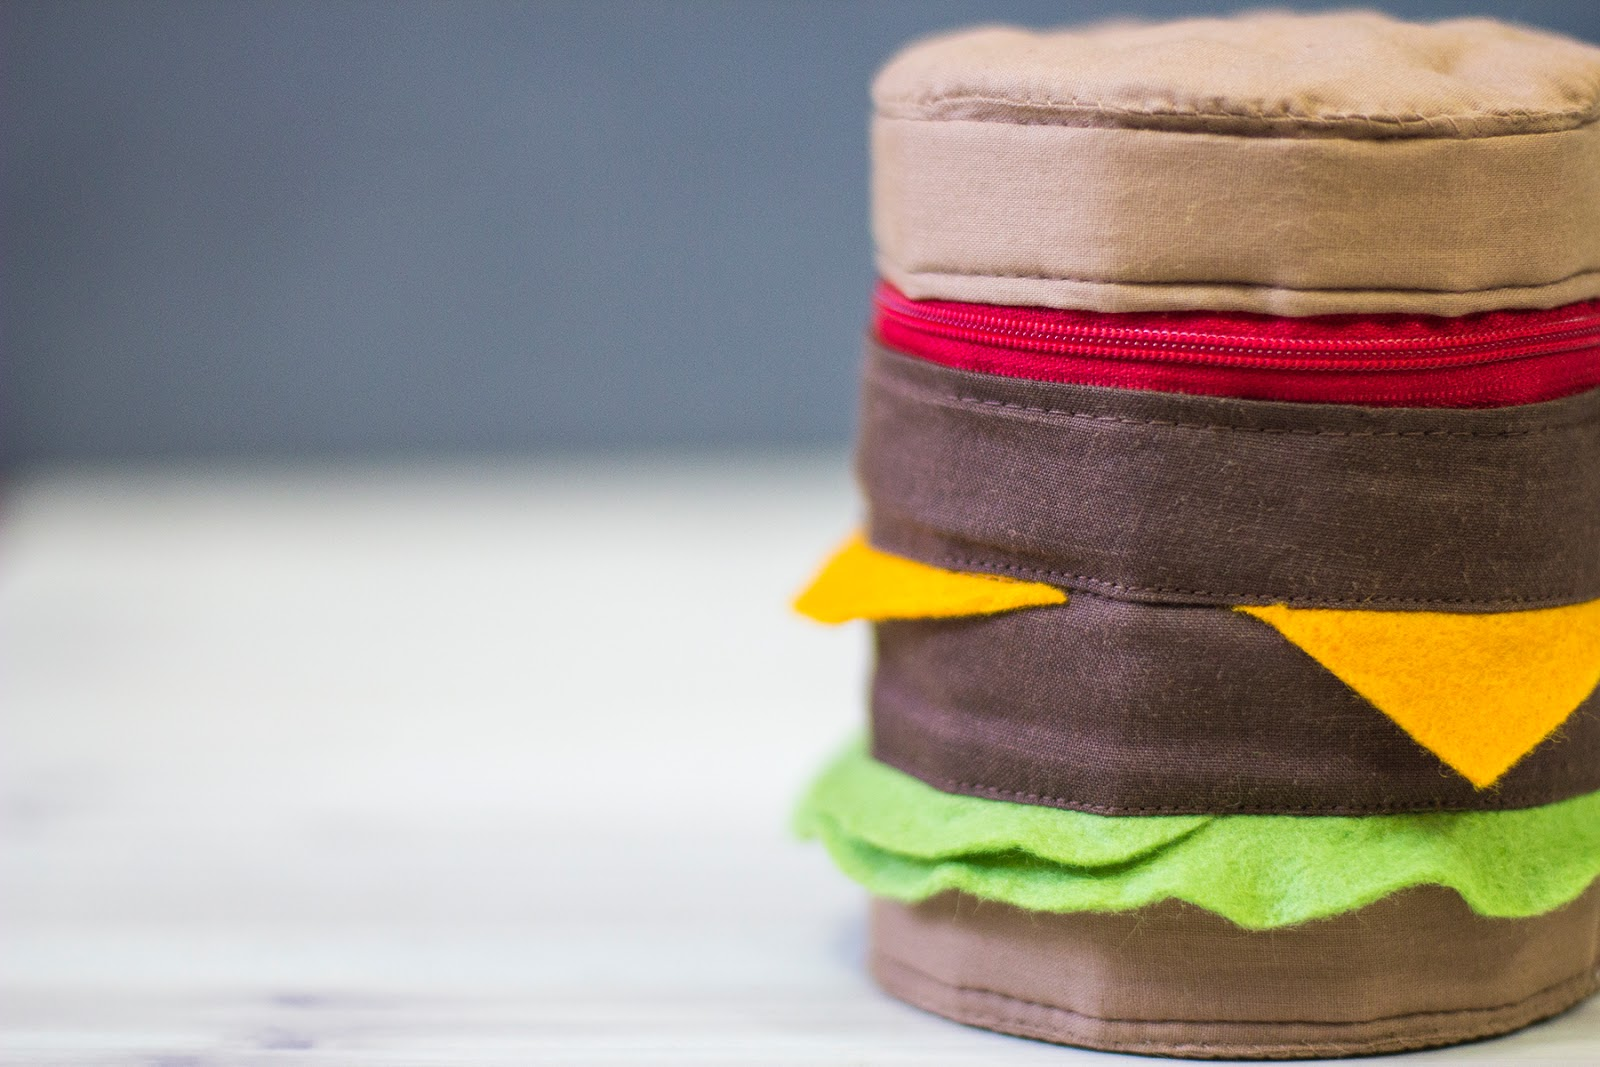 Burger Zipped Pouch DIY Tutorial